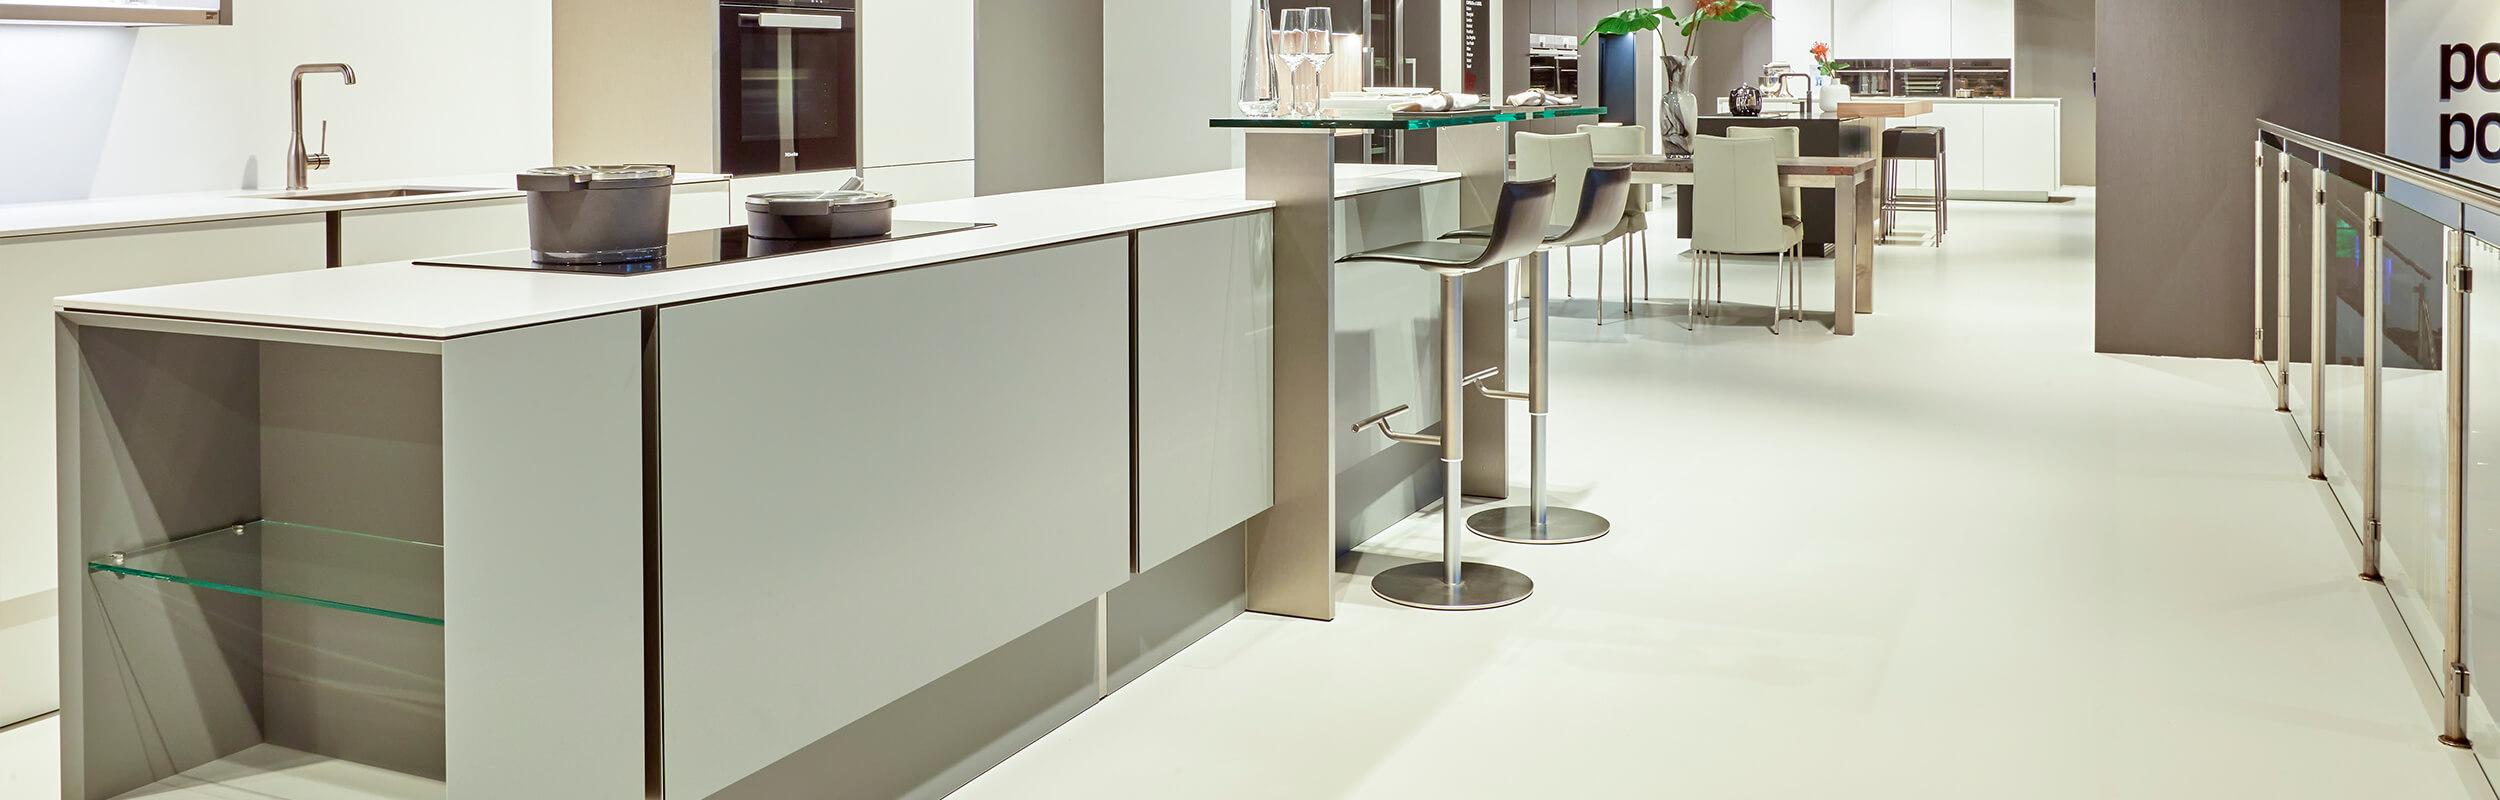 Gietvloer-showroom-Fusion